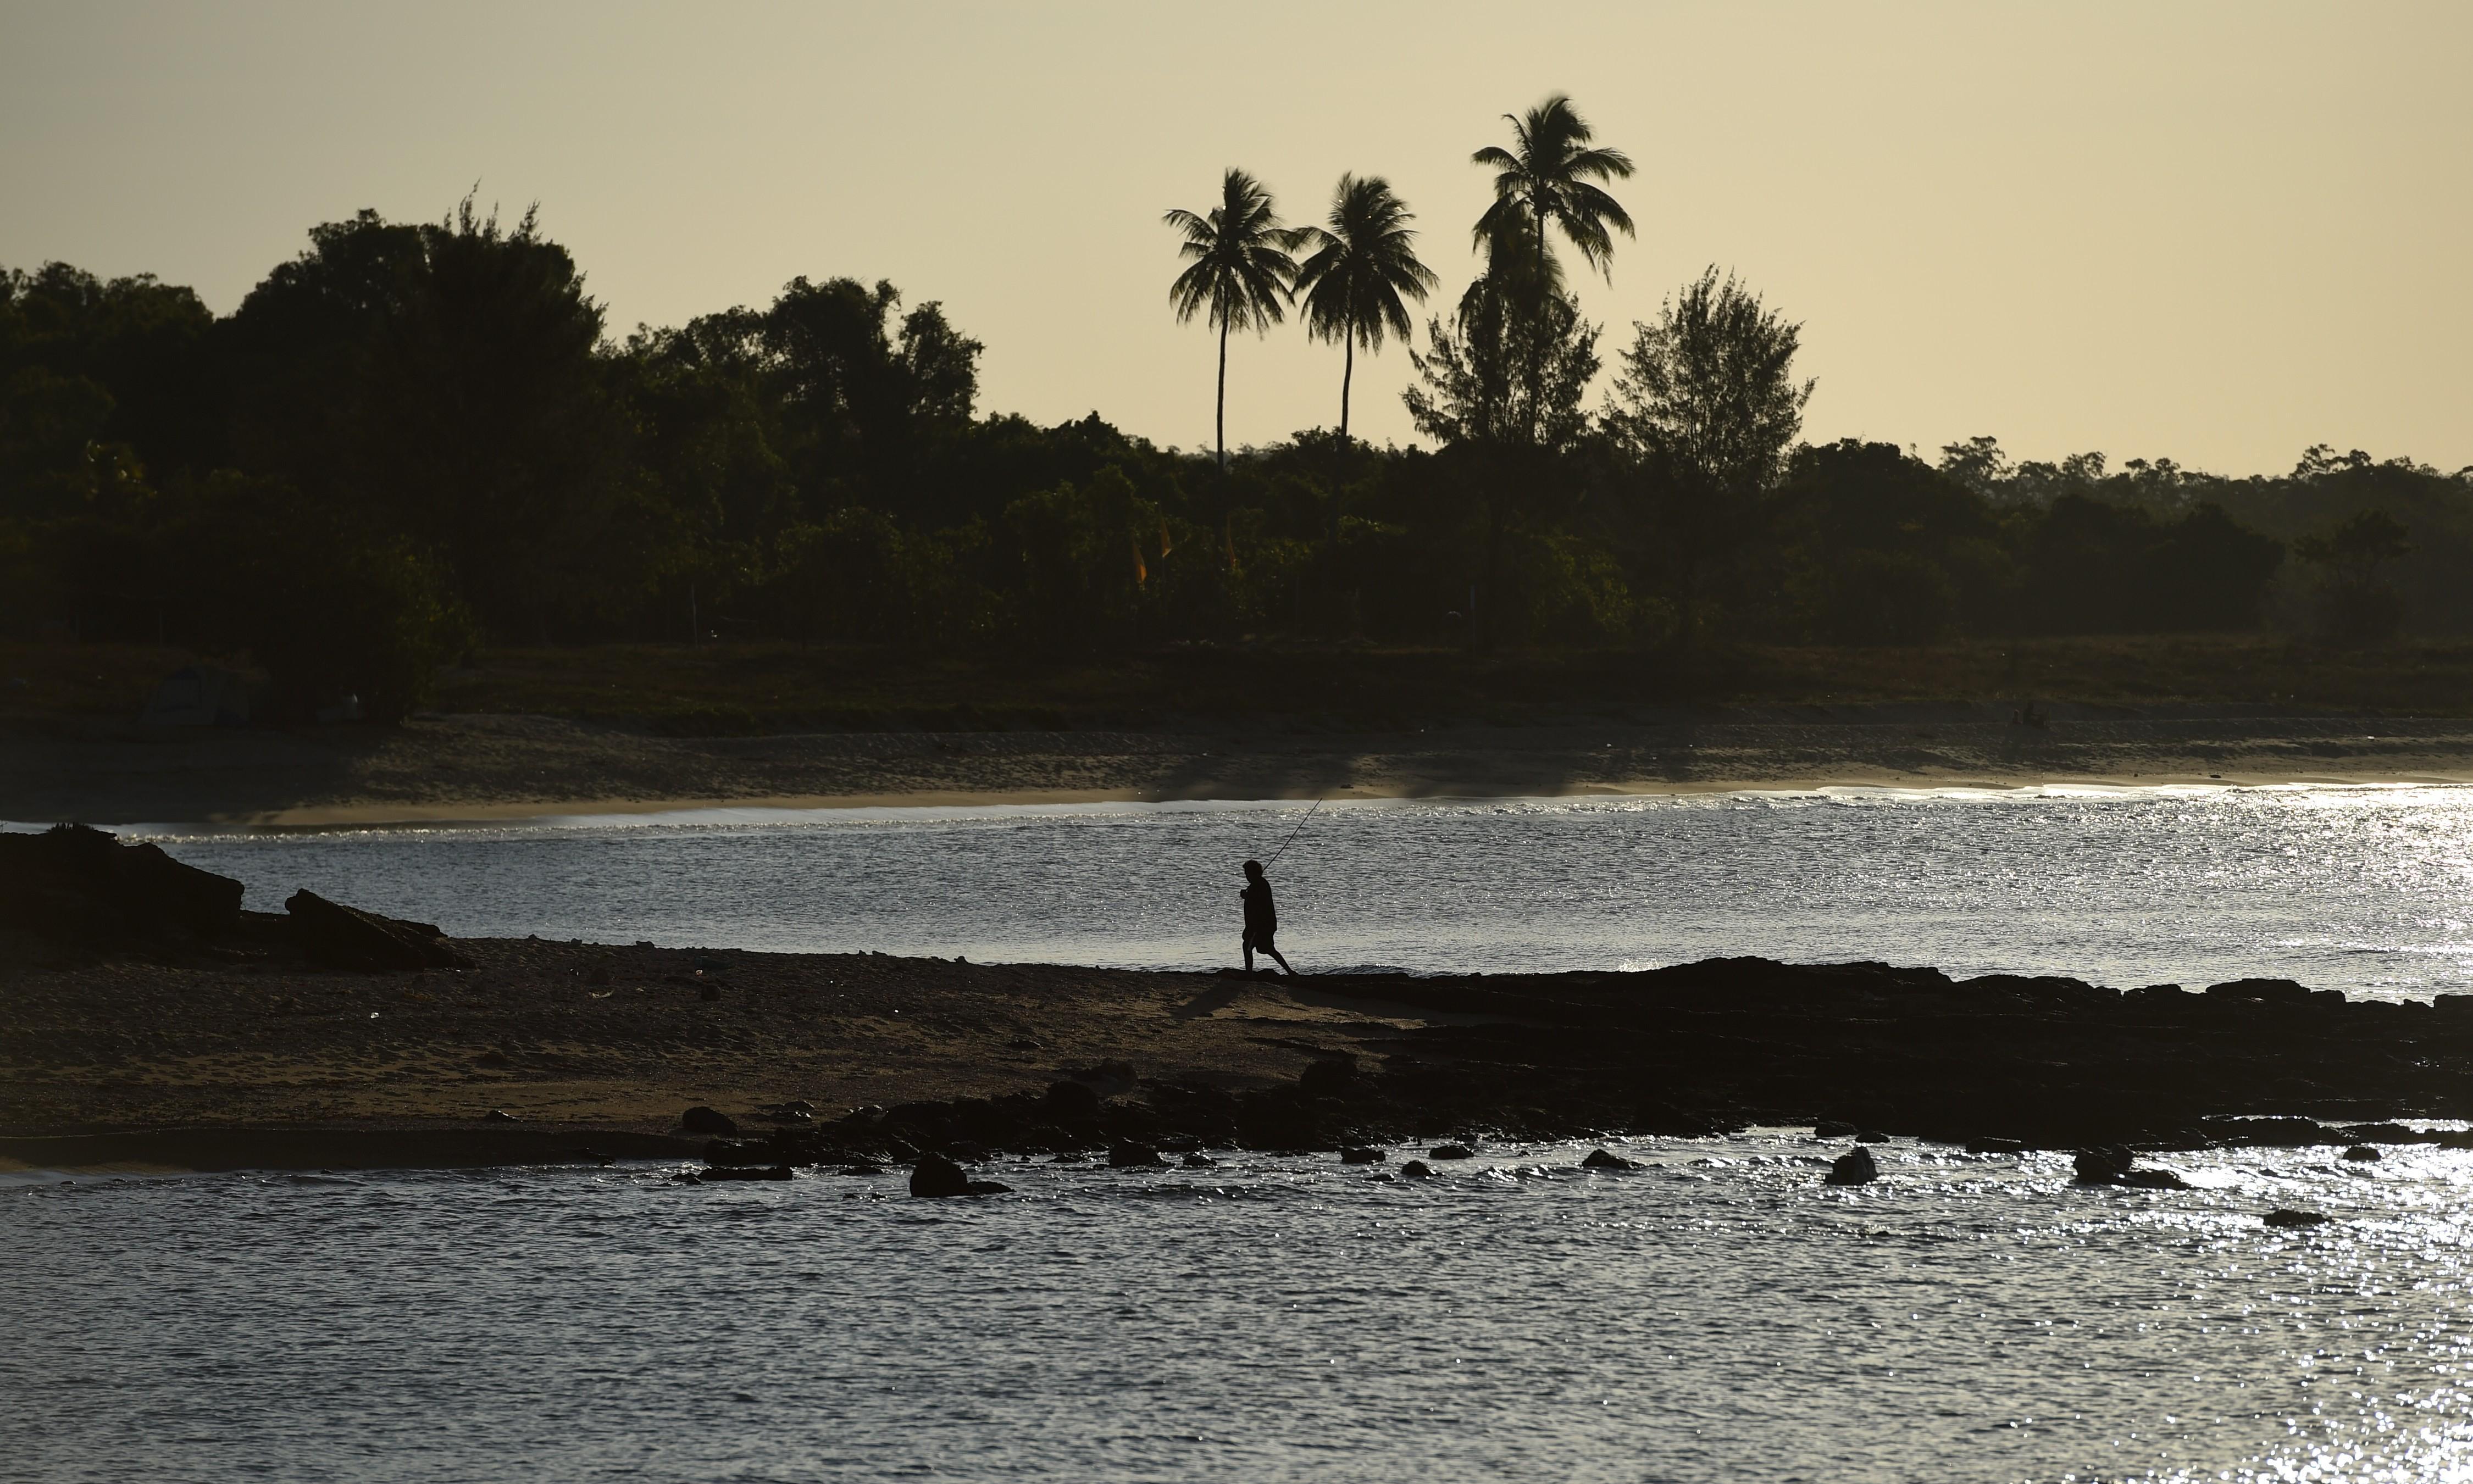 What price spiritual connection? Yolngu seek compensation for cultural destruction